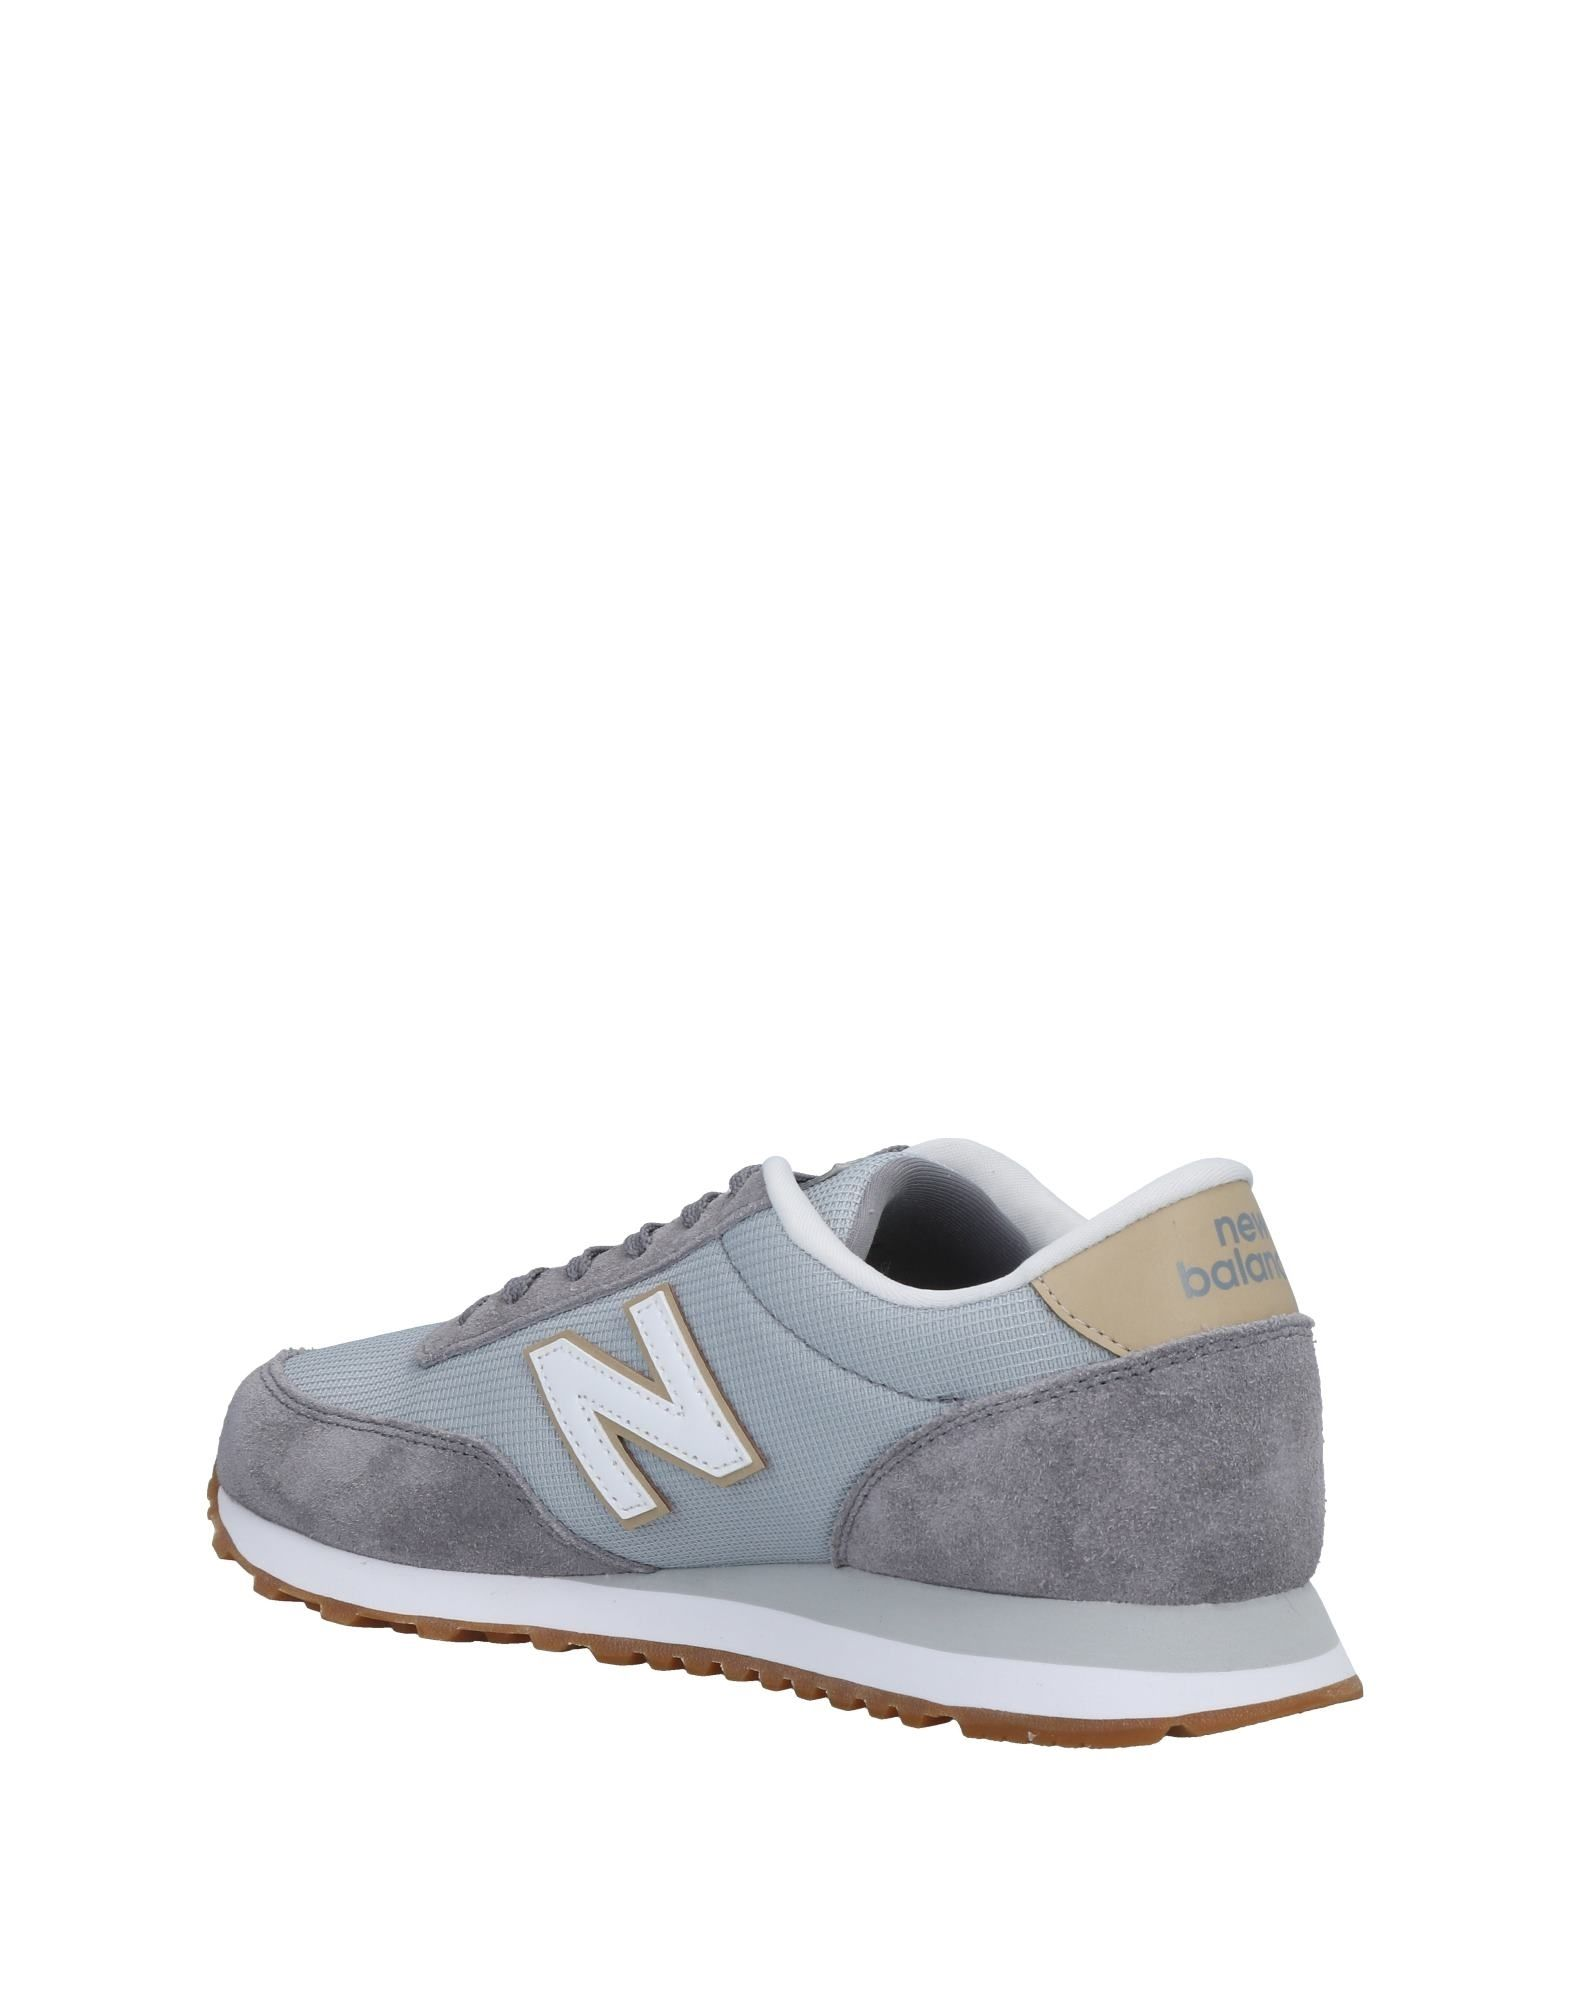 Rabatt echte Schuhe Balance New Balance Schuhe Sneakers Herren  11476836WM abf176